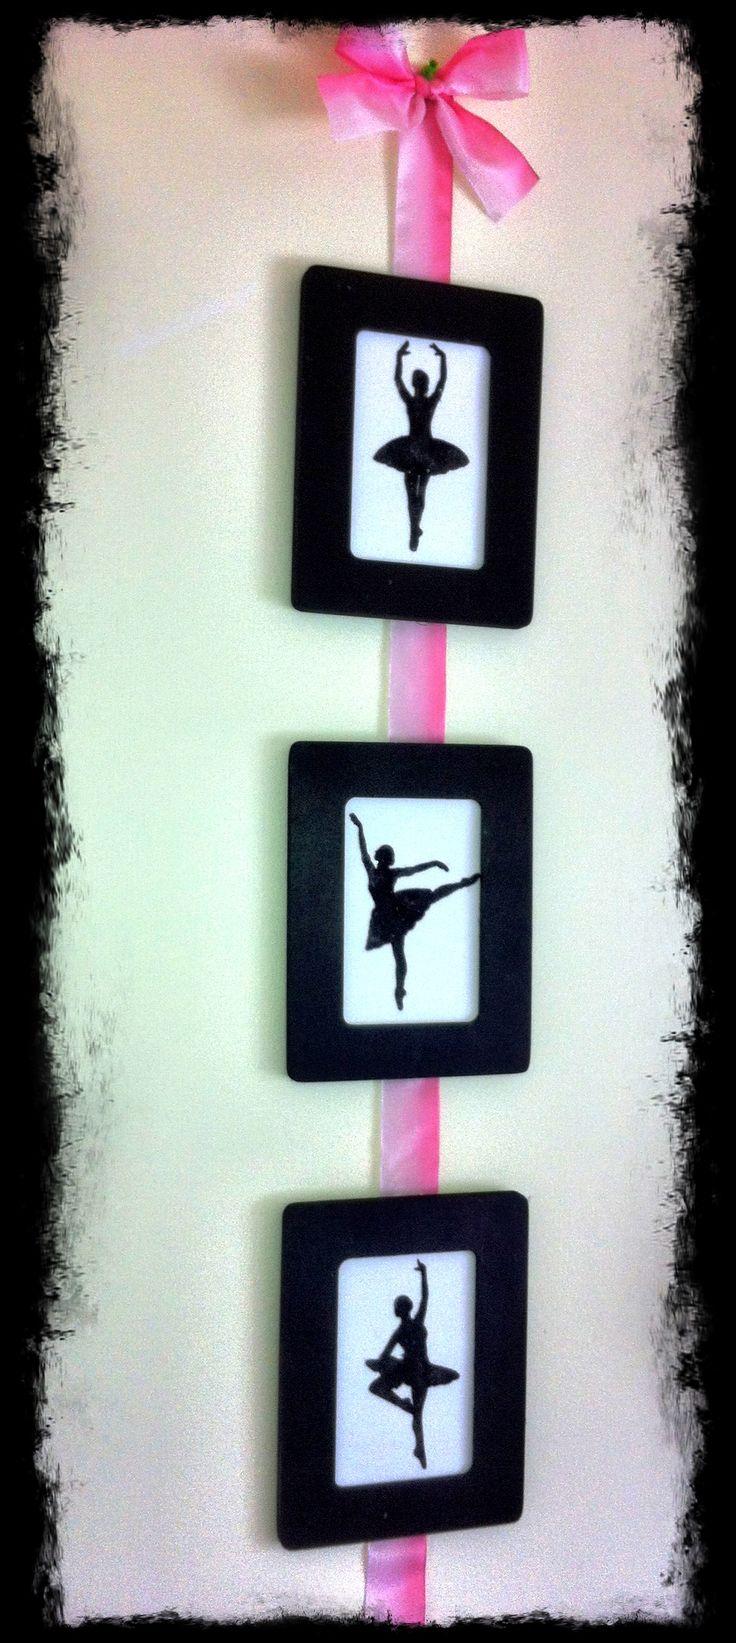 Dance decor using the Silhouette Cameo..project ideas  dance, cheer, gymnastics  etc.